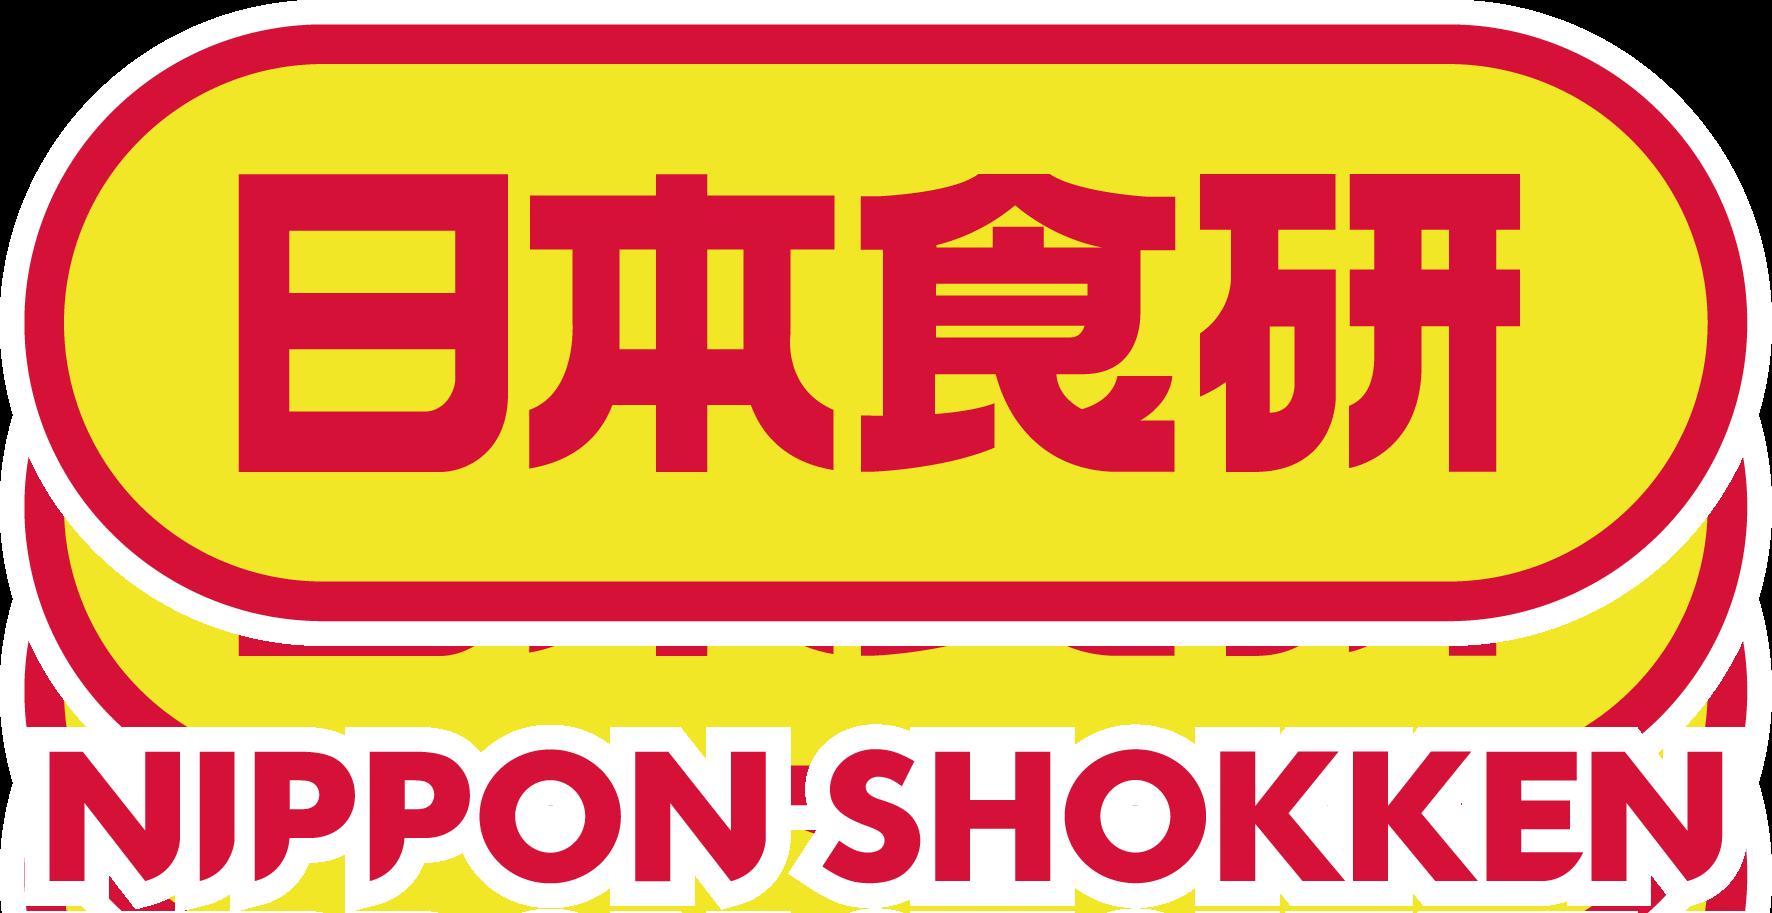 NipponShokken